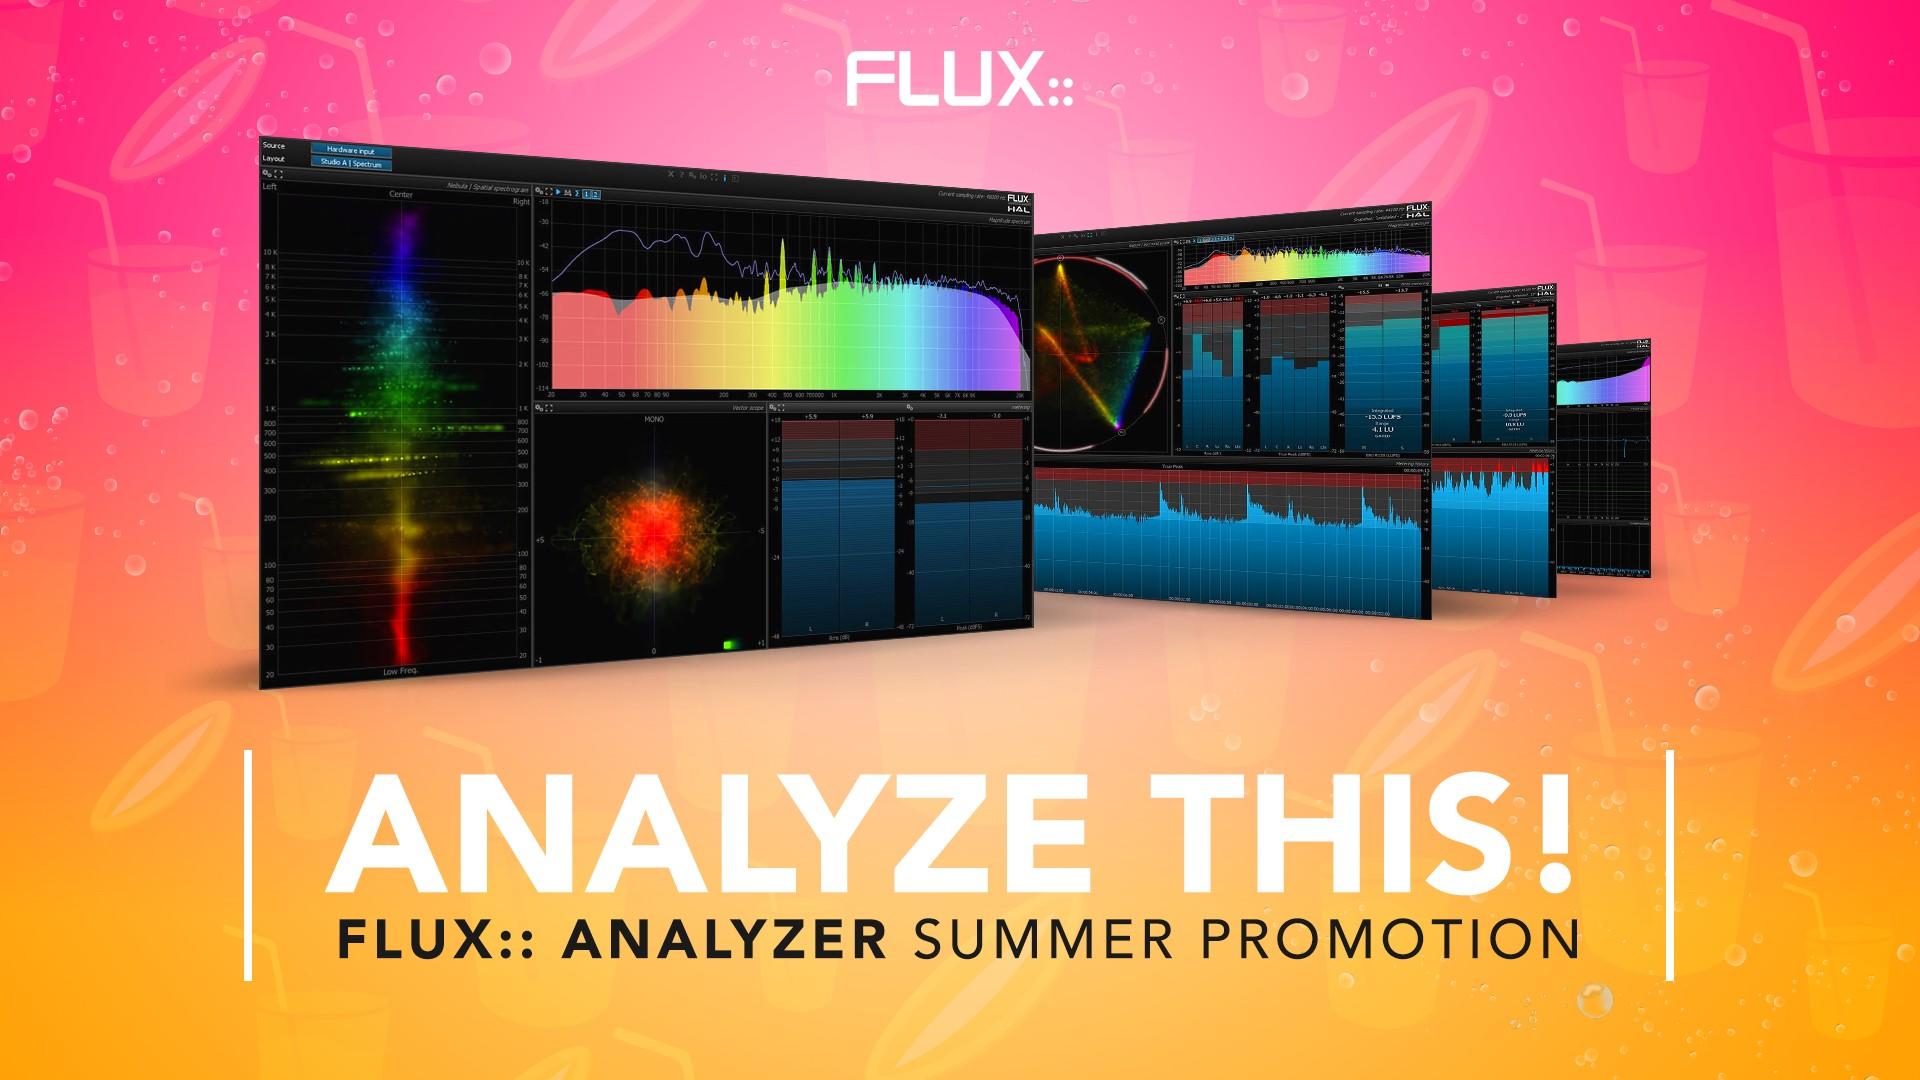 Flux:: Analyzer 分析软件夏季促销